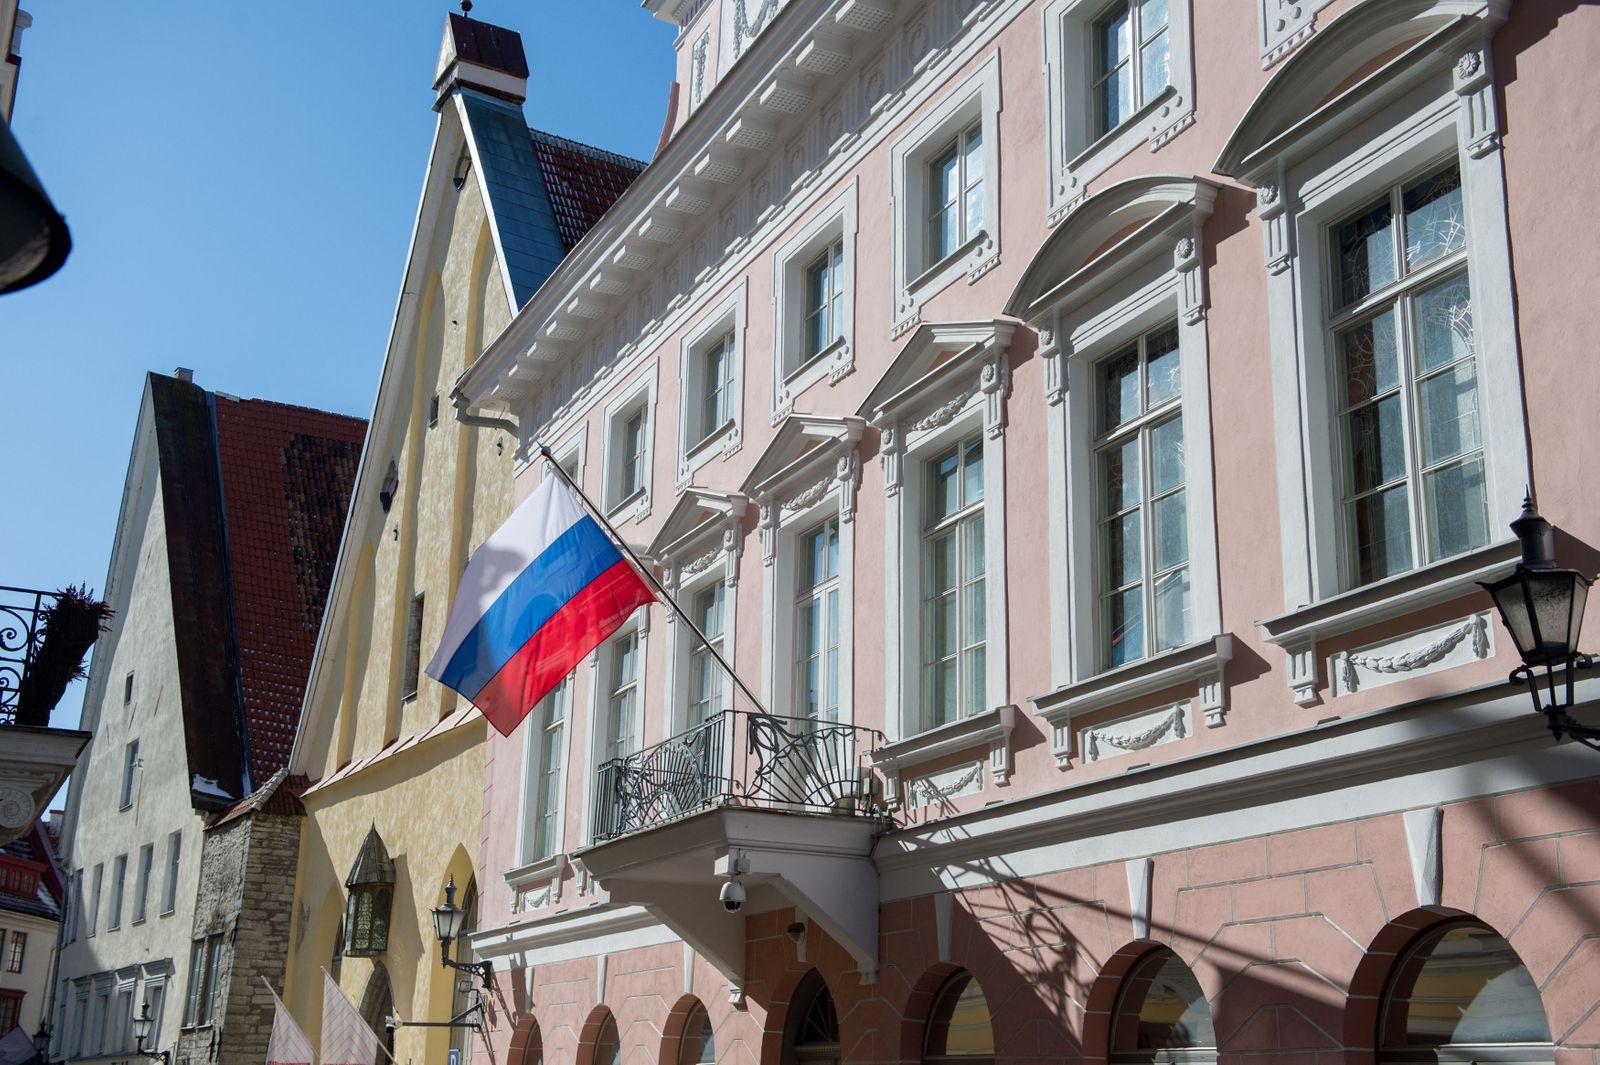 FILES-LITHUANIA-ESTONIA-LATVIA-RUSSIA-DIPLOMACY-ESPIONAGE